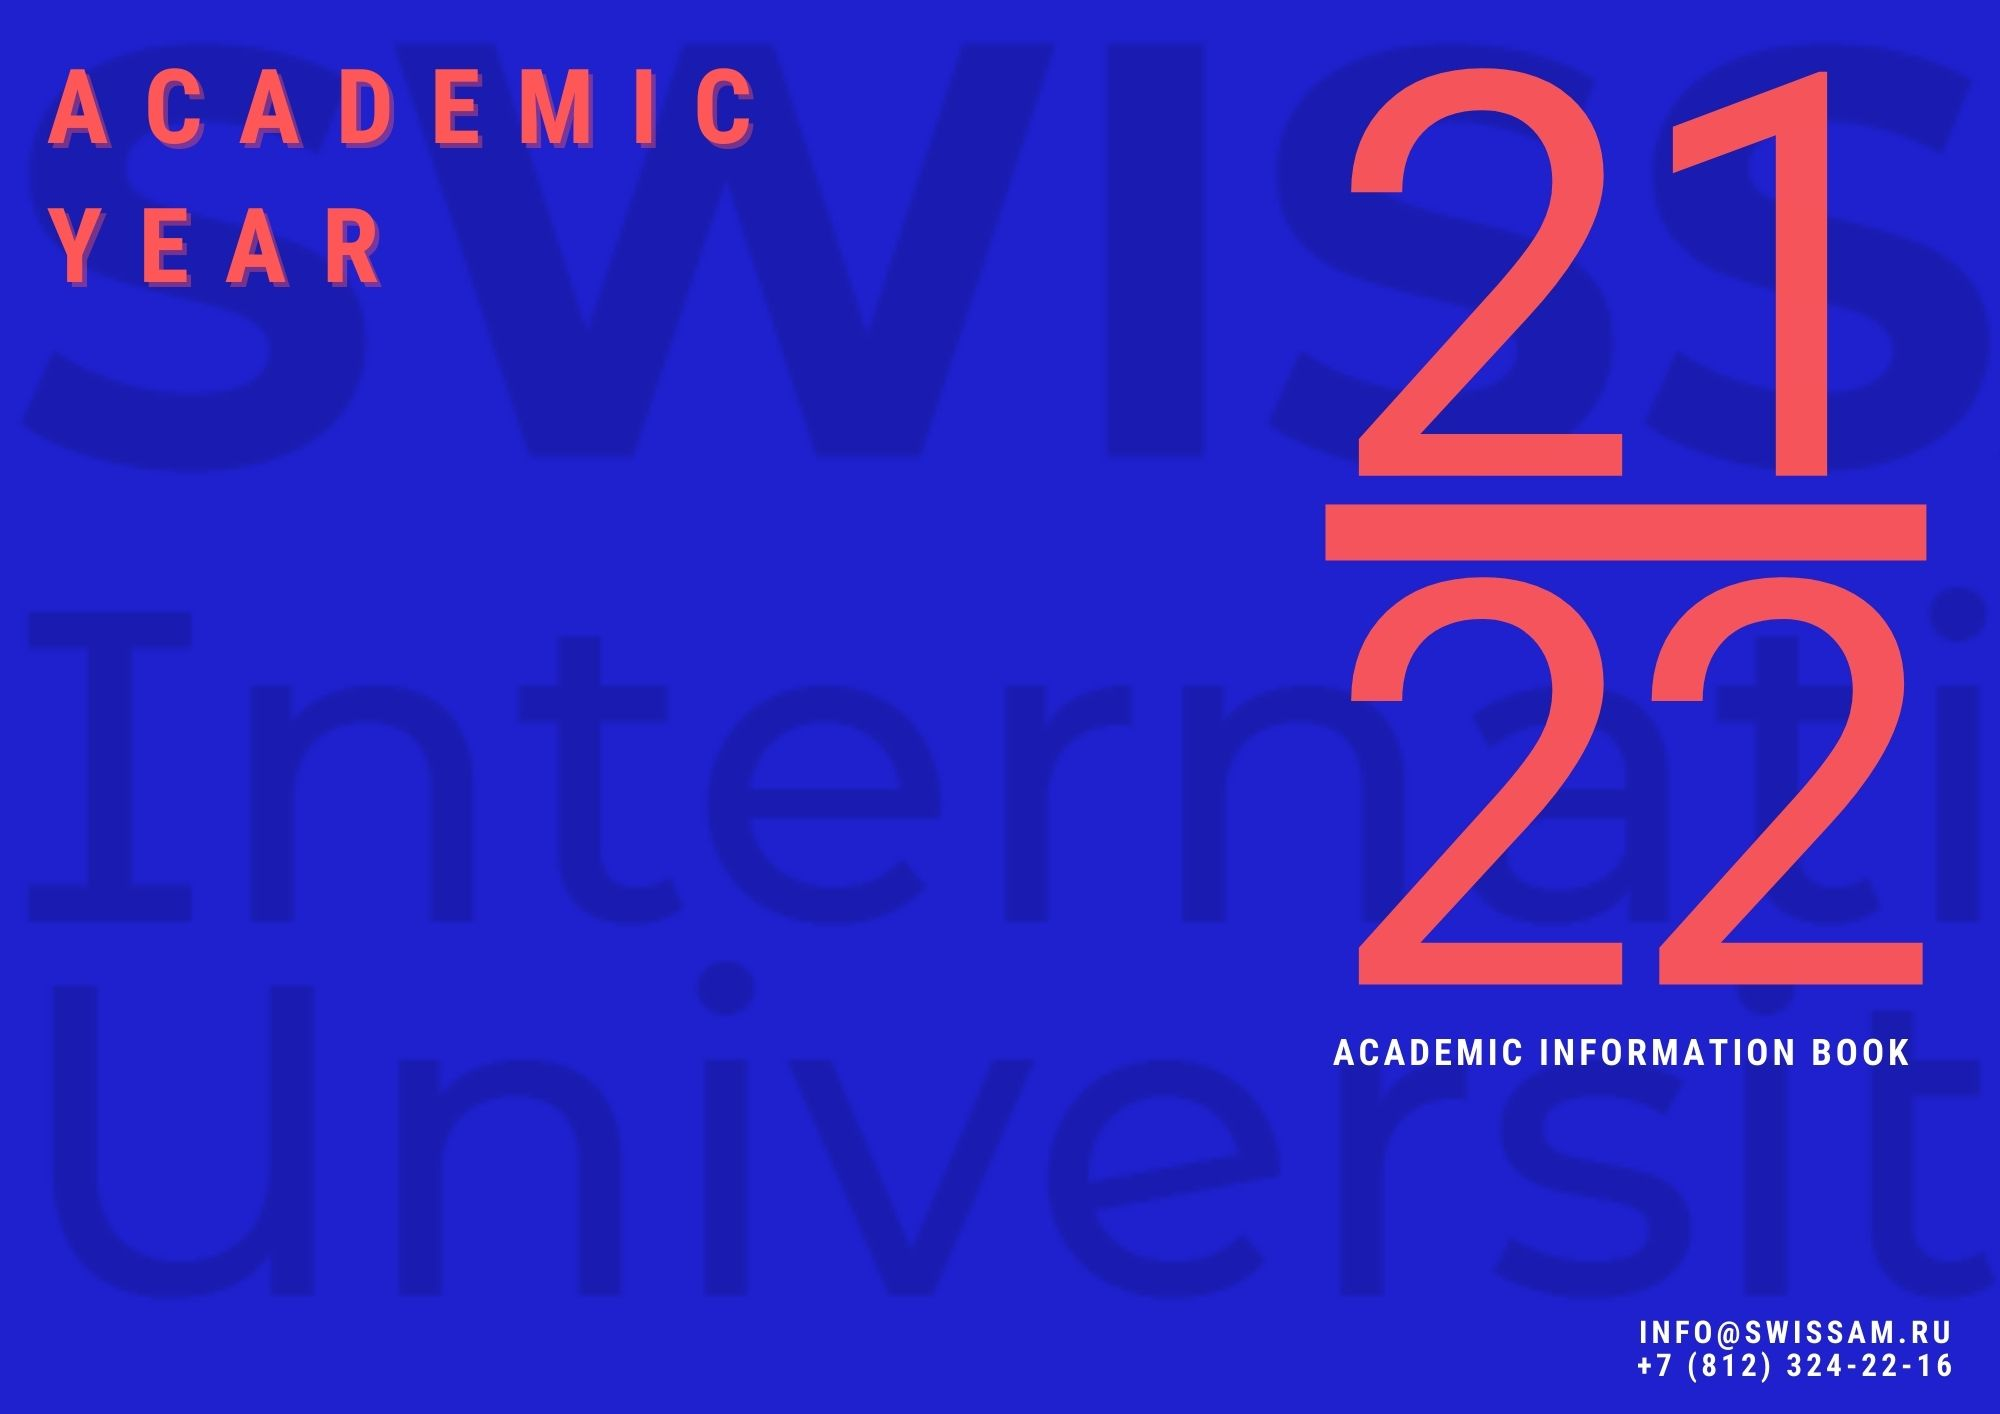 Academic calendar 21/22